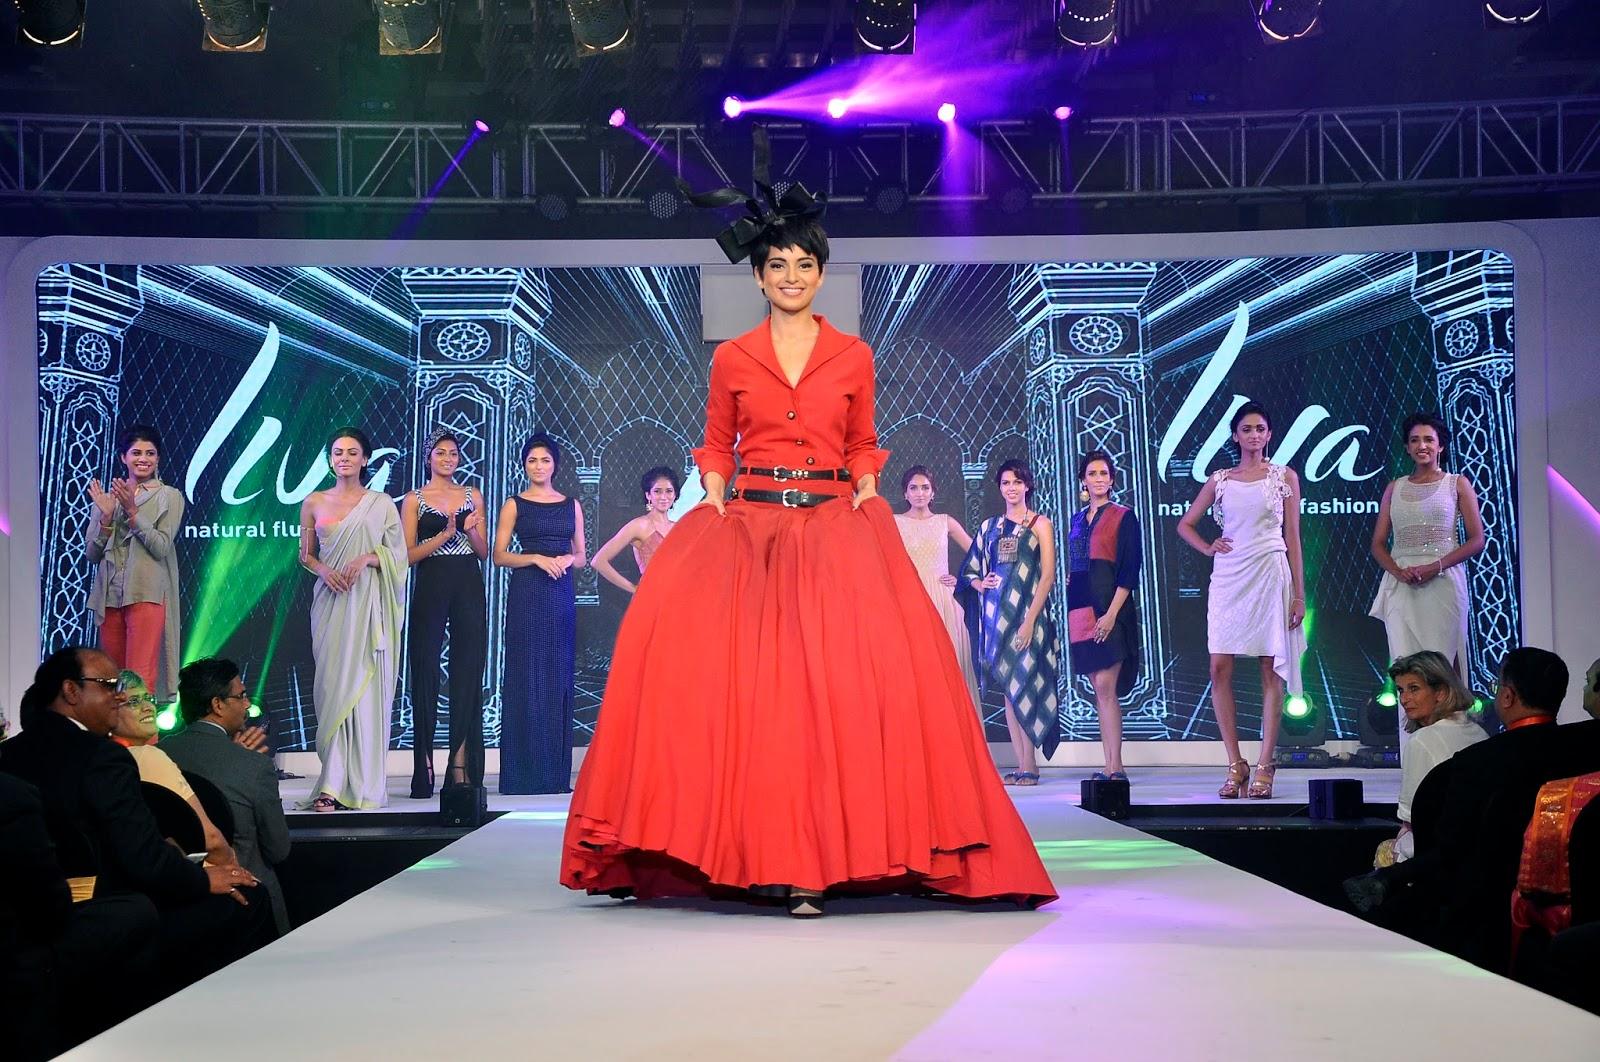 Kangana Ranaut walks the ramp with other models donninf LIVA, the new age fluid fabrics